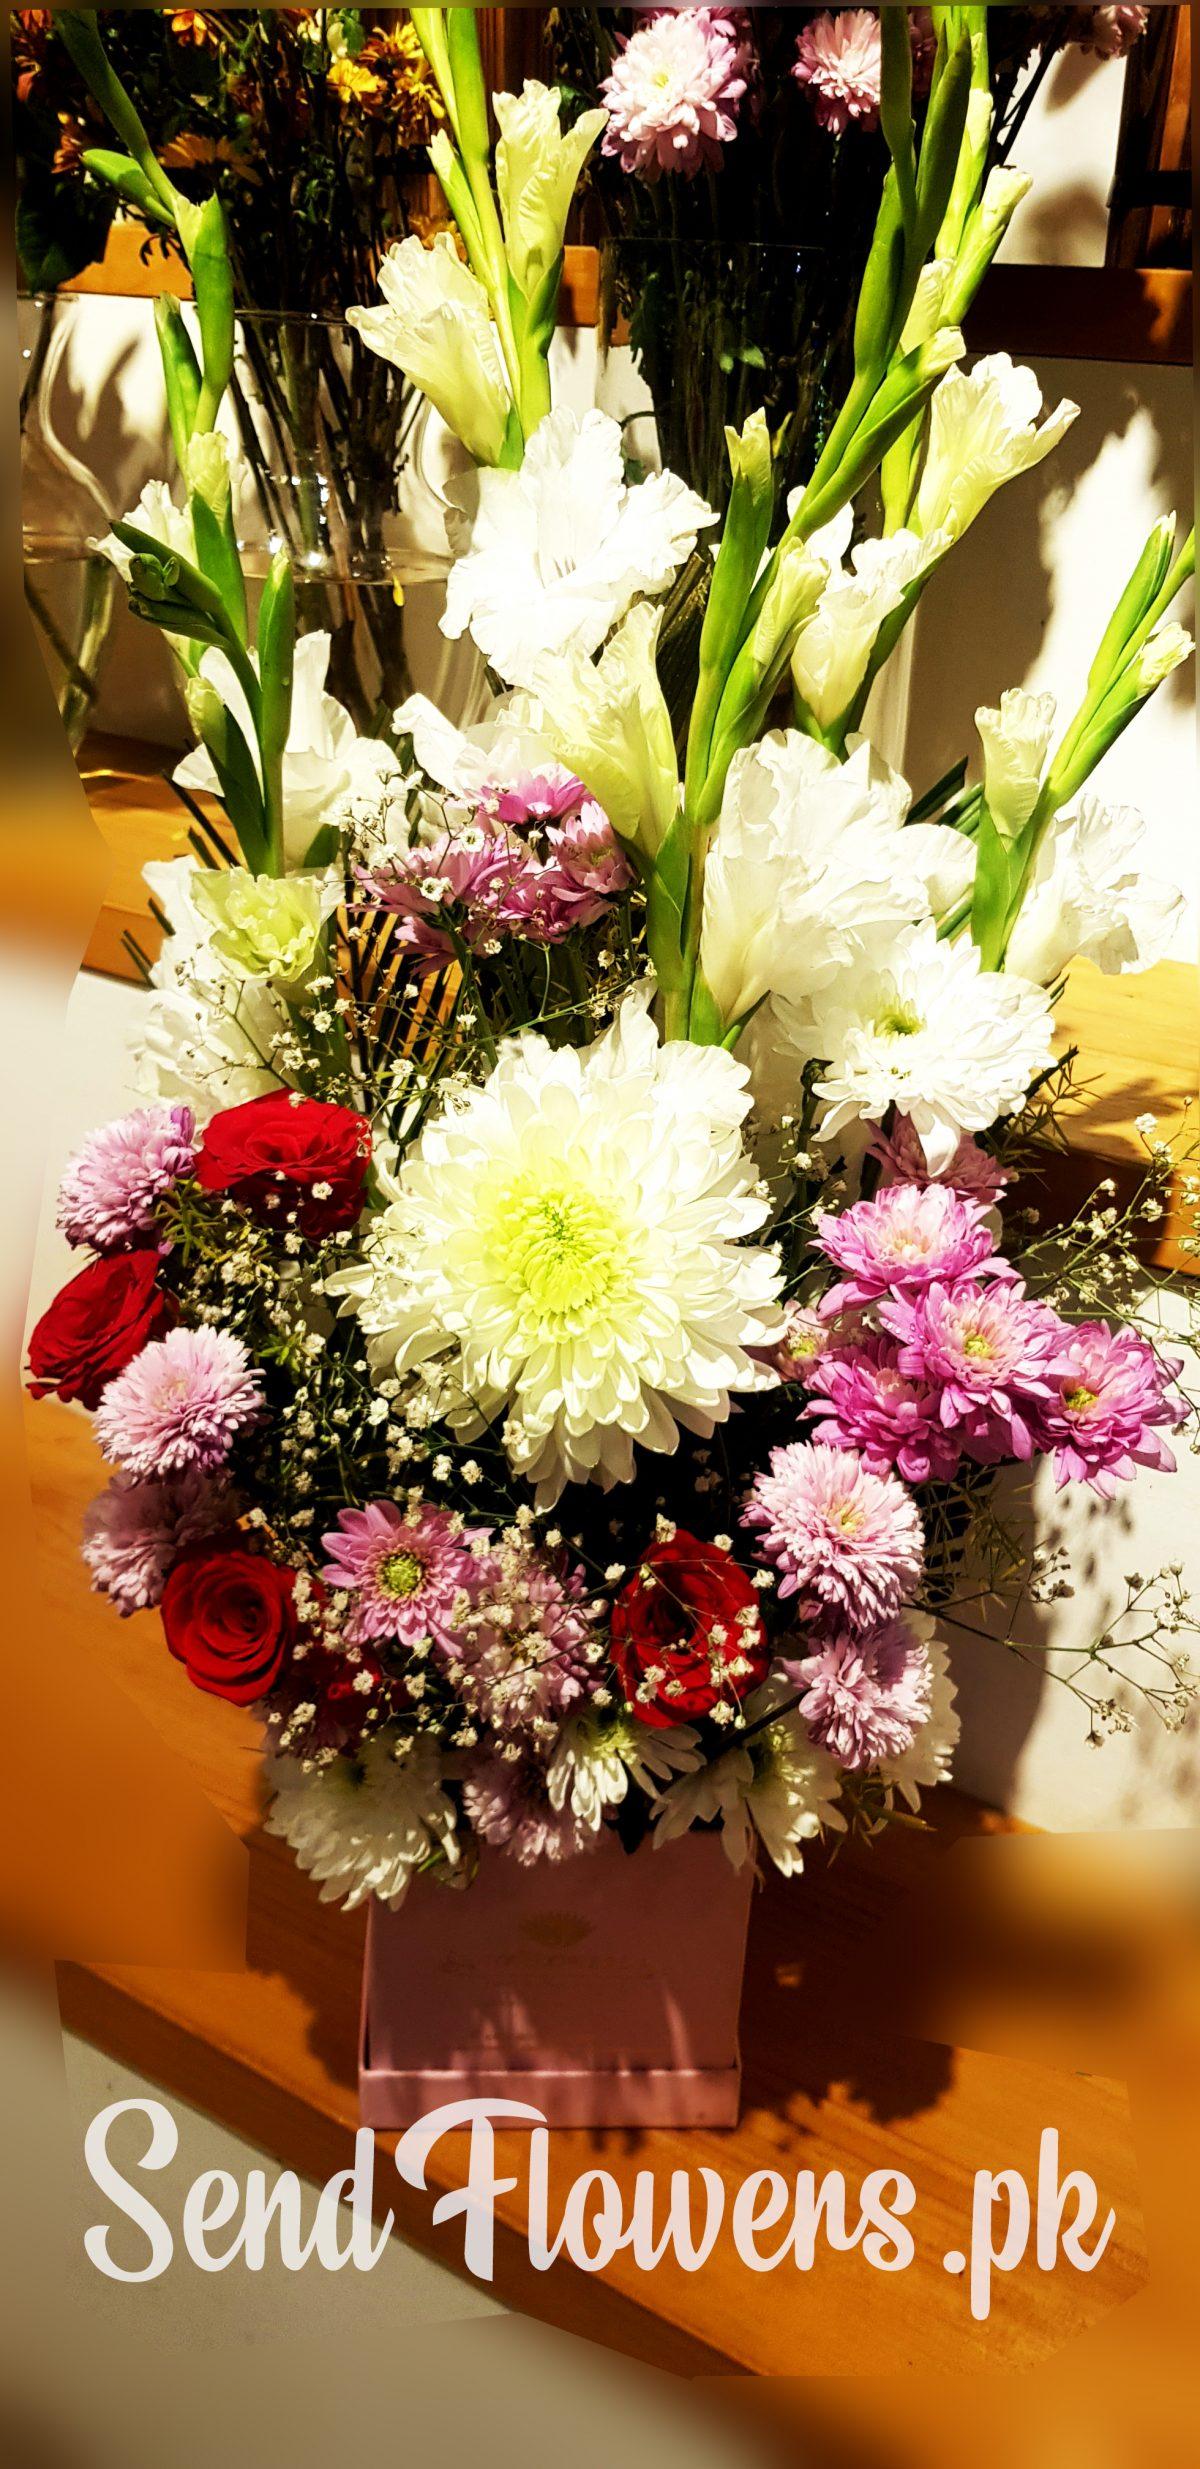 Online flower box delivery Pakistan_SendFlowers.pk